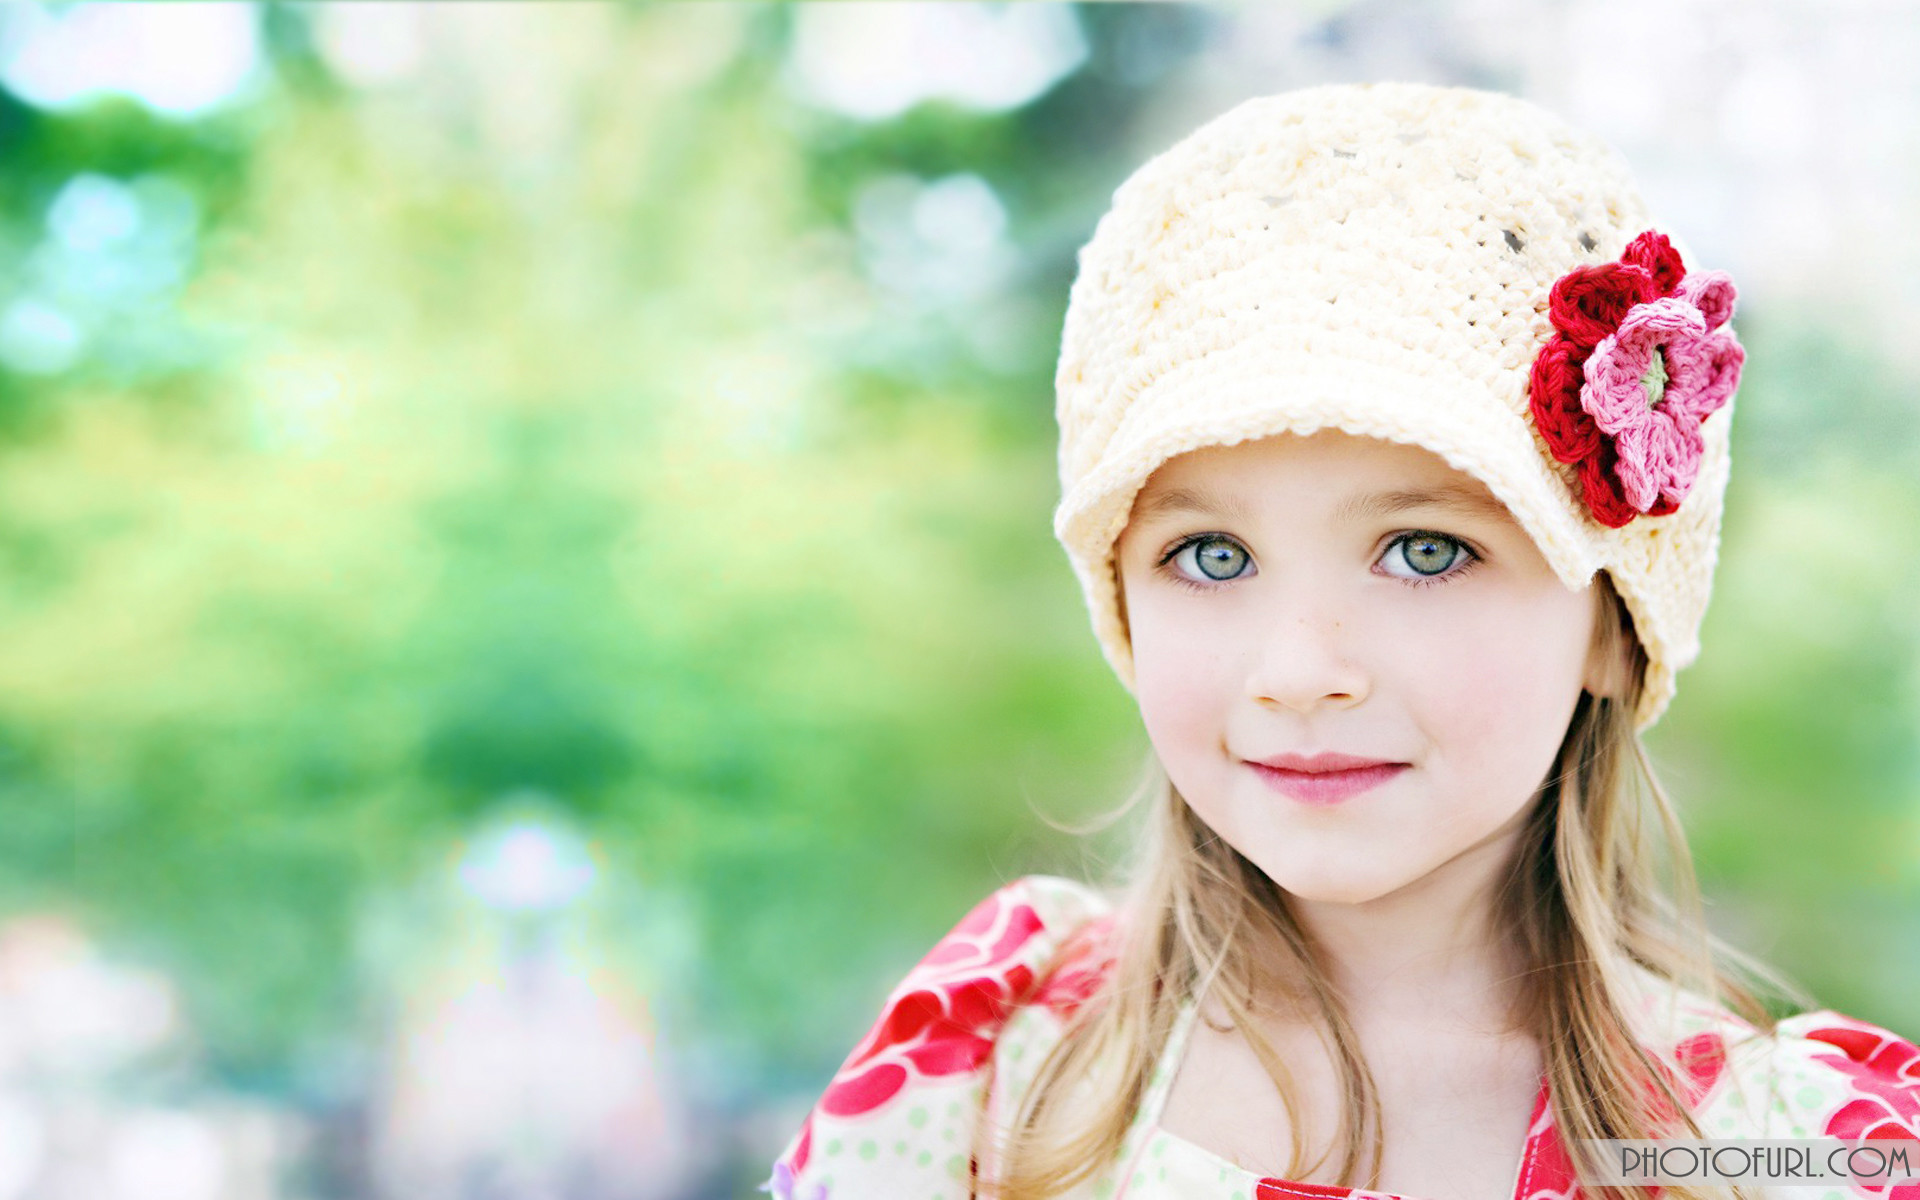 cbbb9f27c64 1920x1200 17 Best ideas about Cute Baby Girl Wallpaper on Pinterest